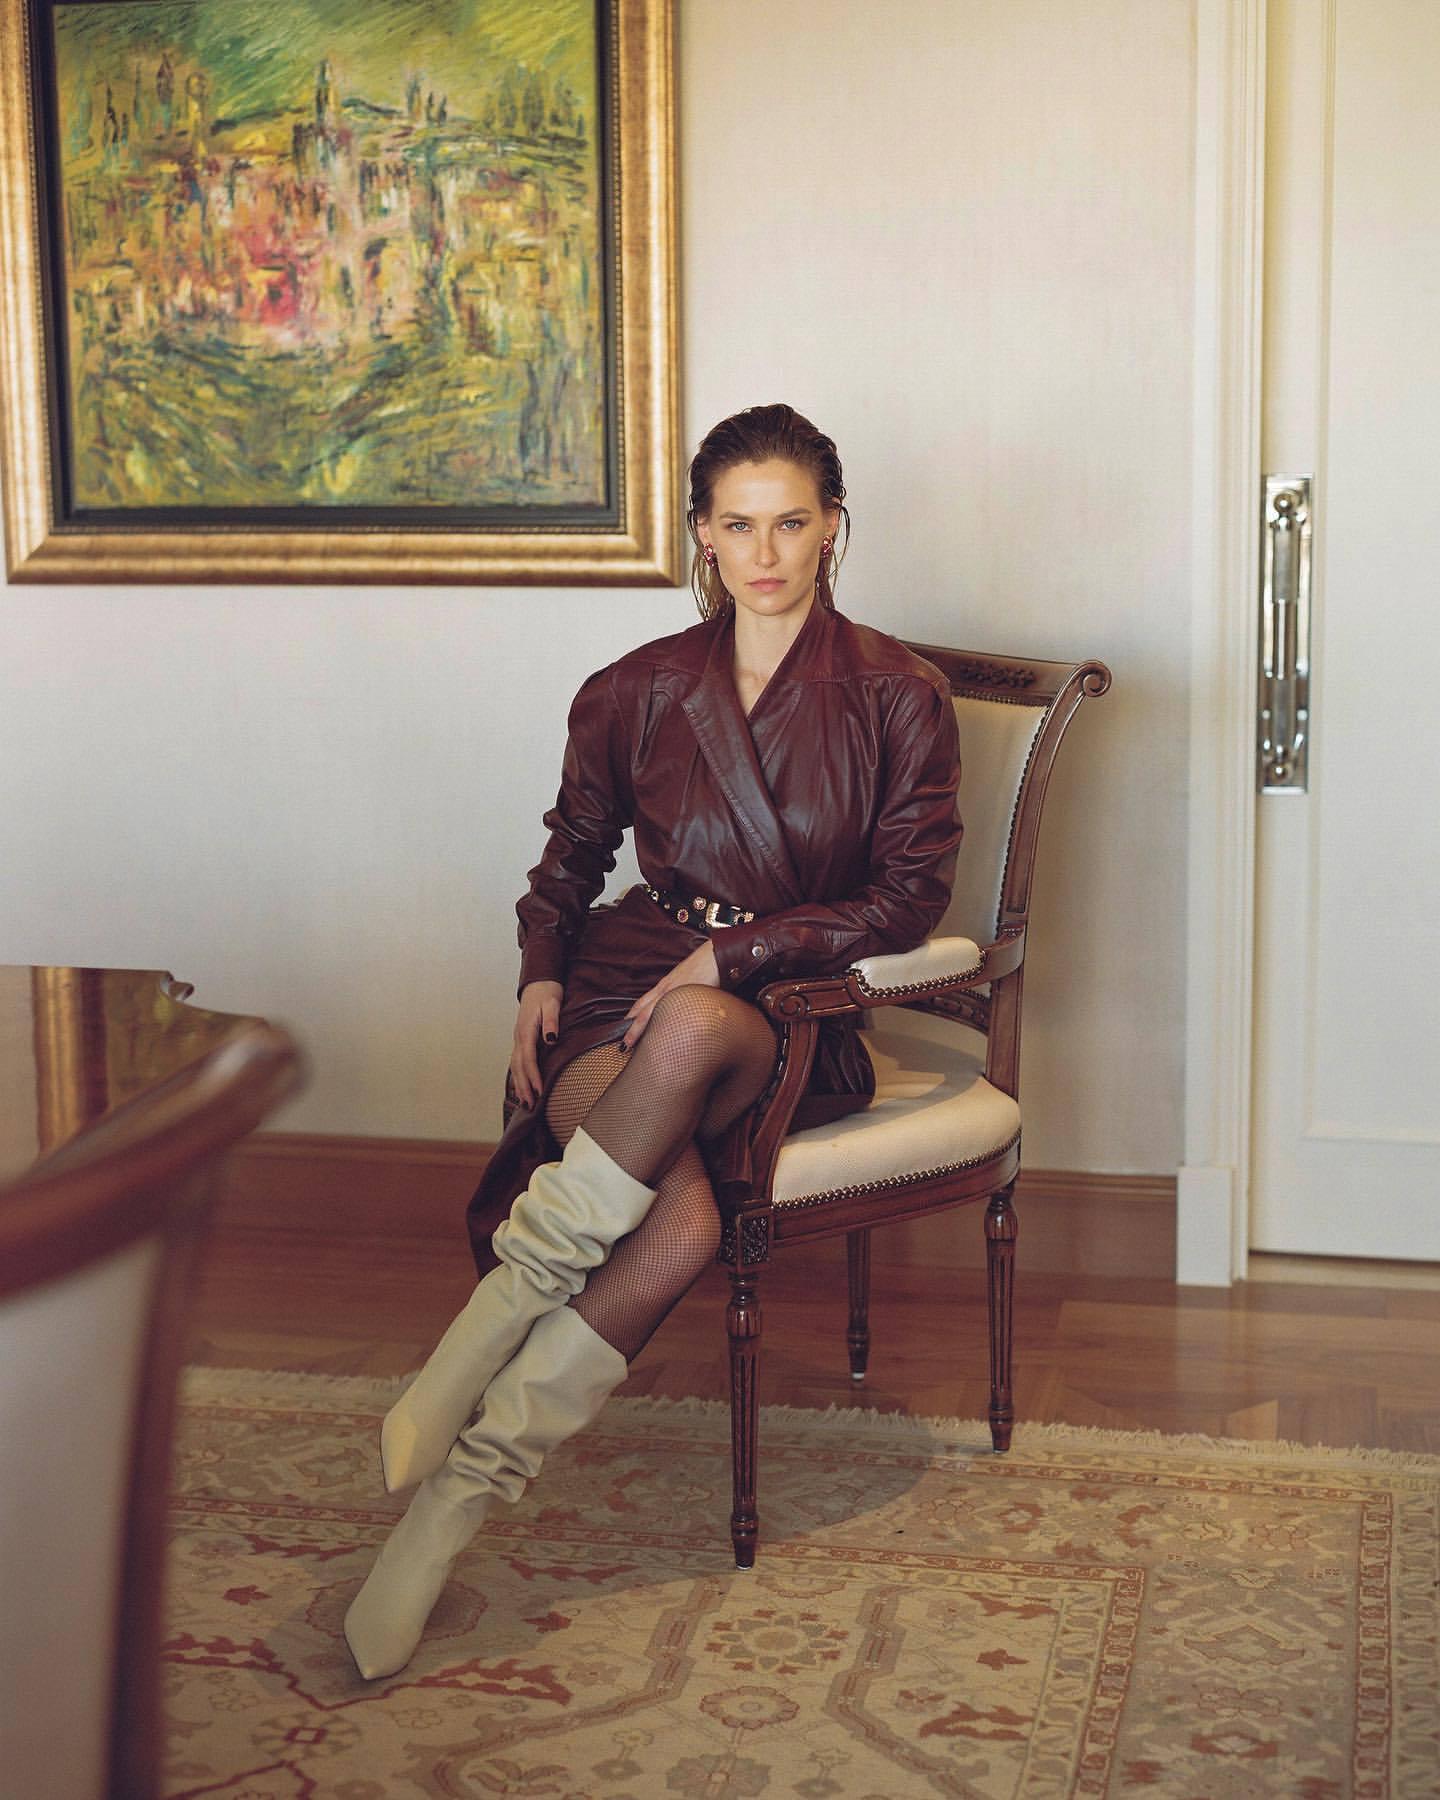 Bar Refaeli – Sexy Legs In Photoshoot For Dodo Bar Or Clothing Line 0017